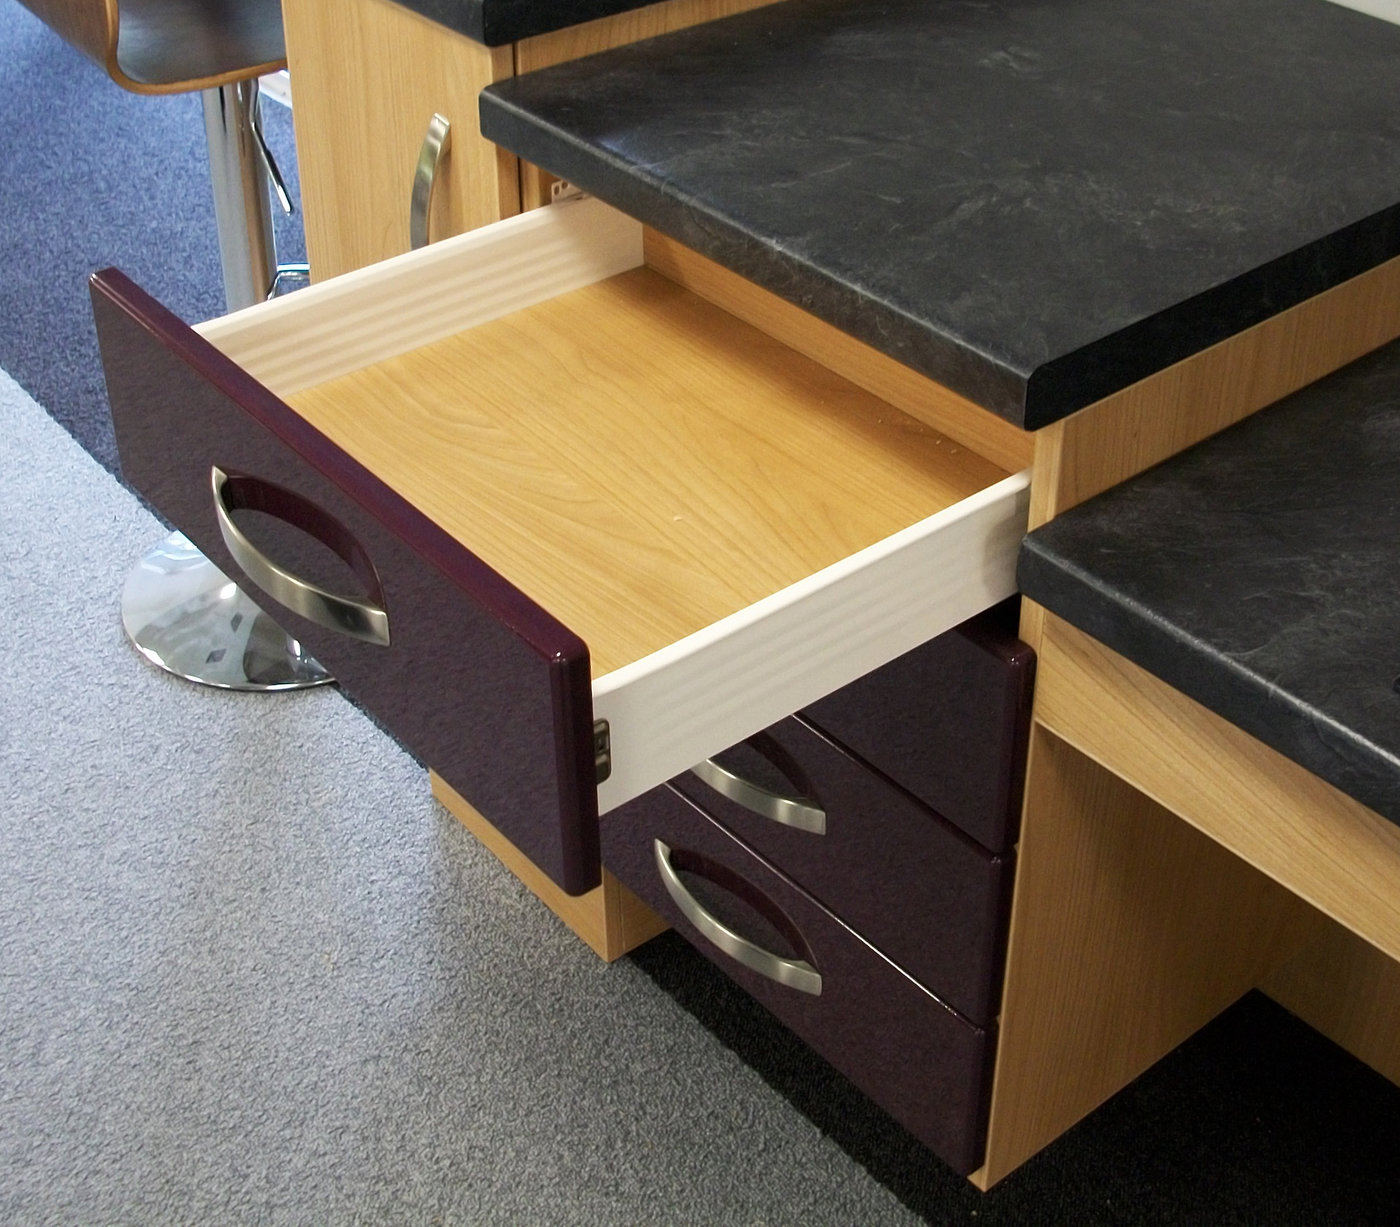 Assisted-Living Kitchen Design By Matt Phelan At Coroflot.com